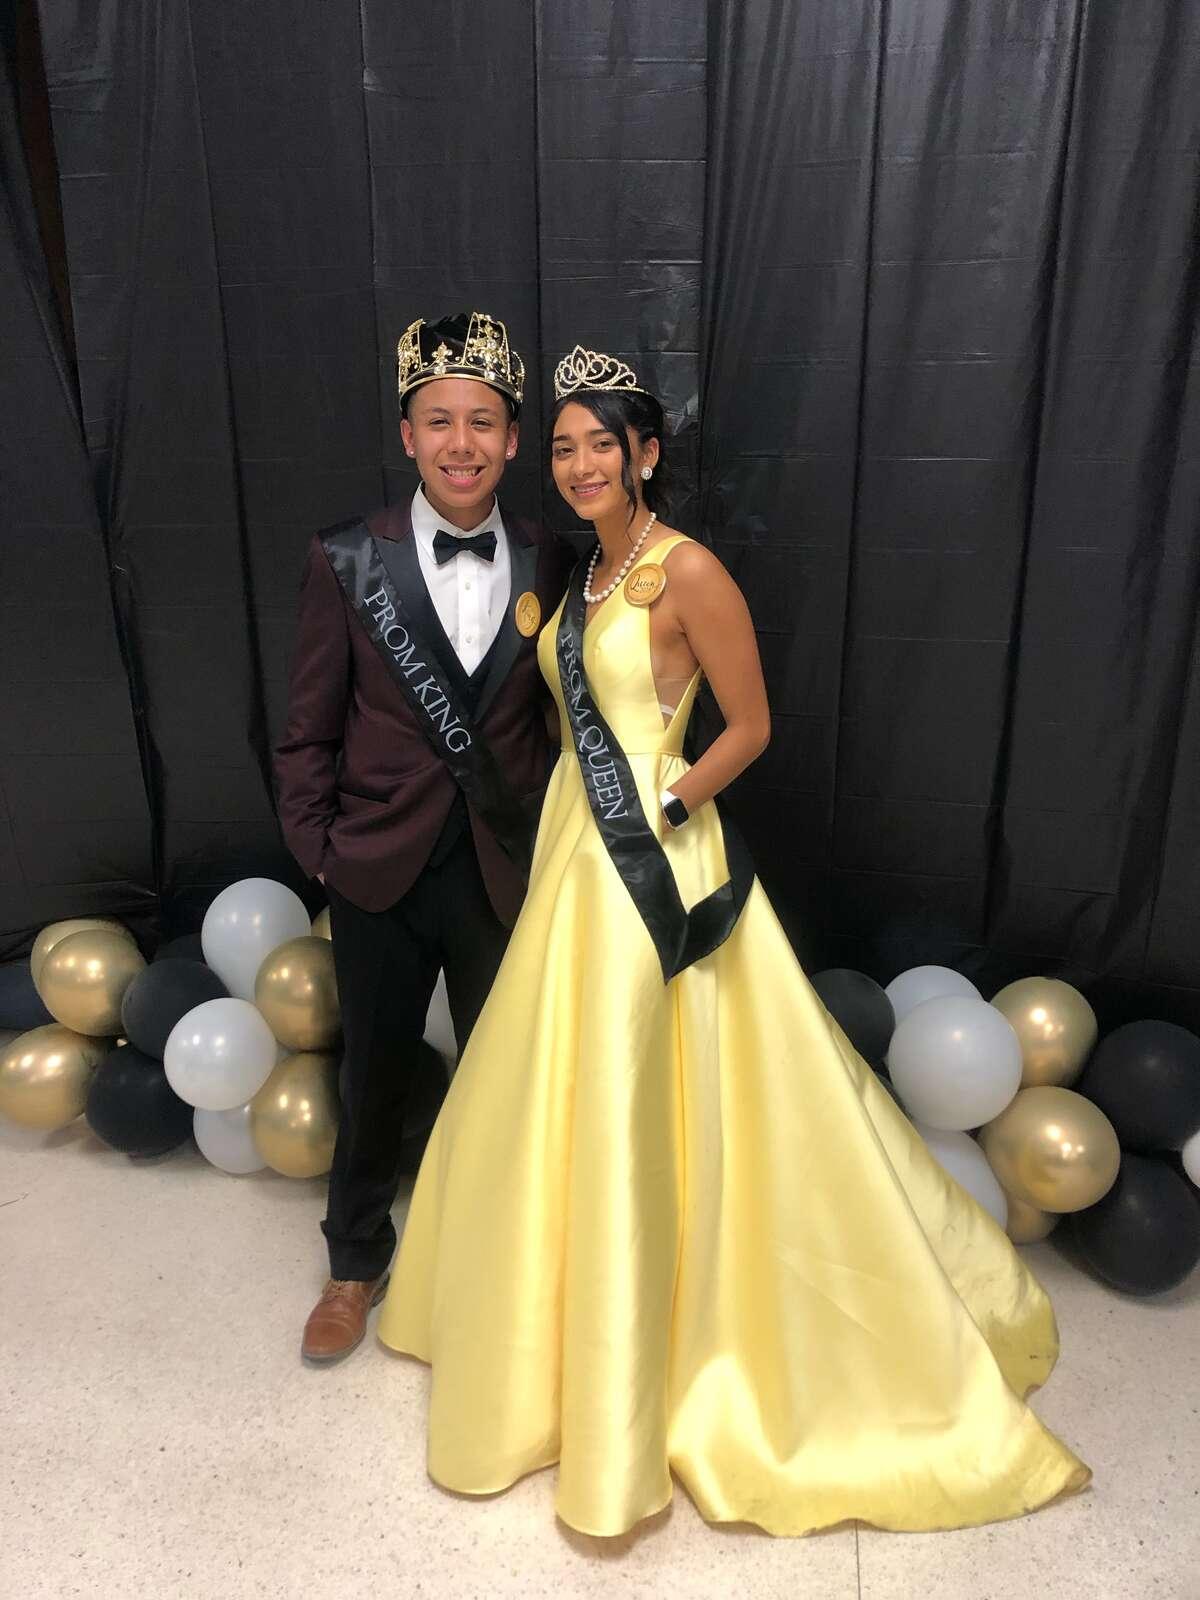 King Peter Guajardo and Queen Kayla Soto